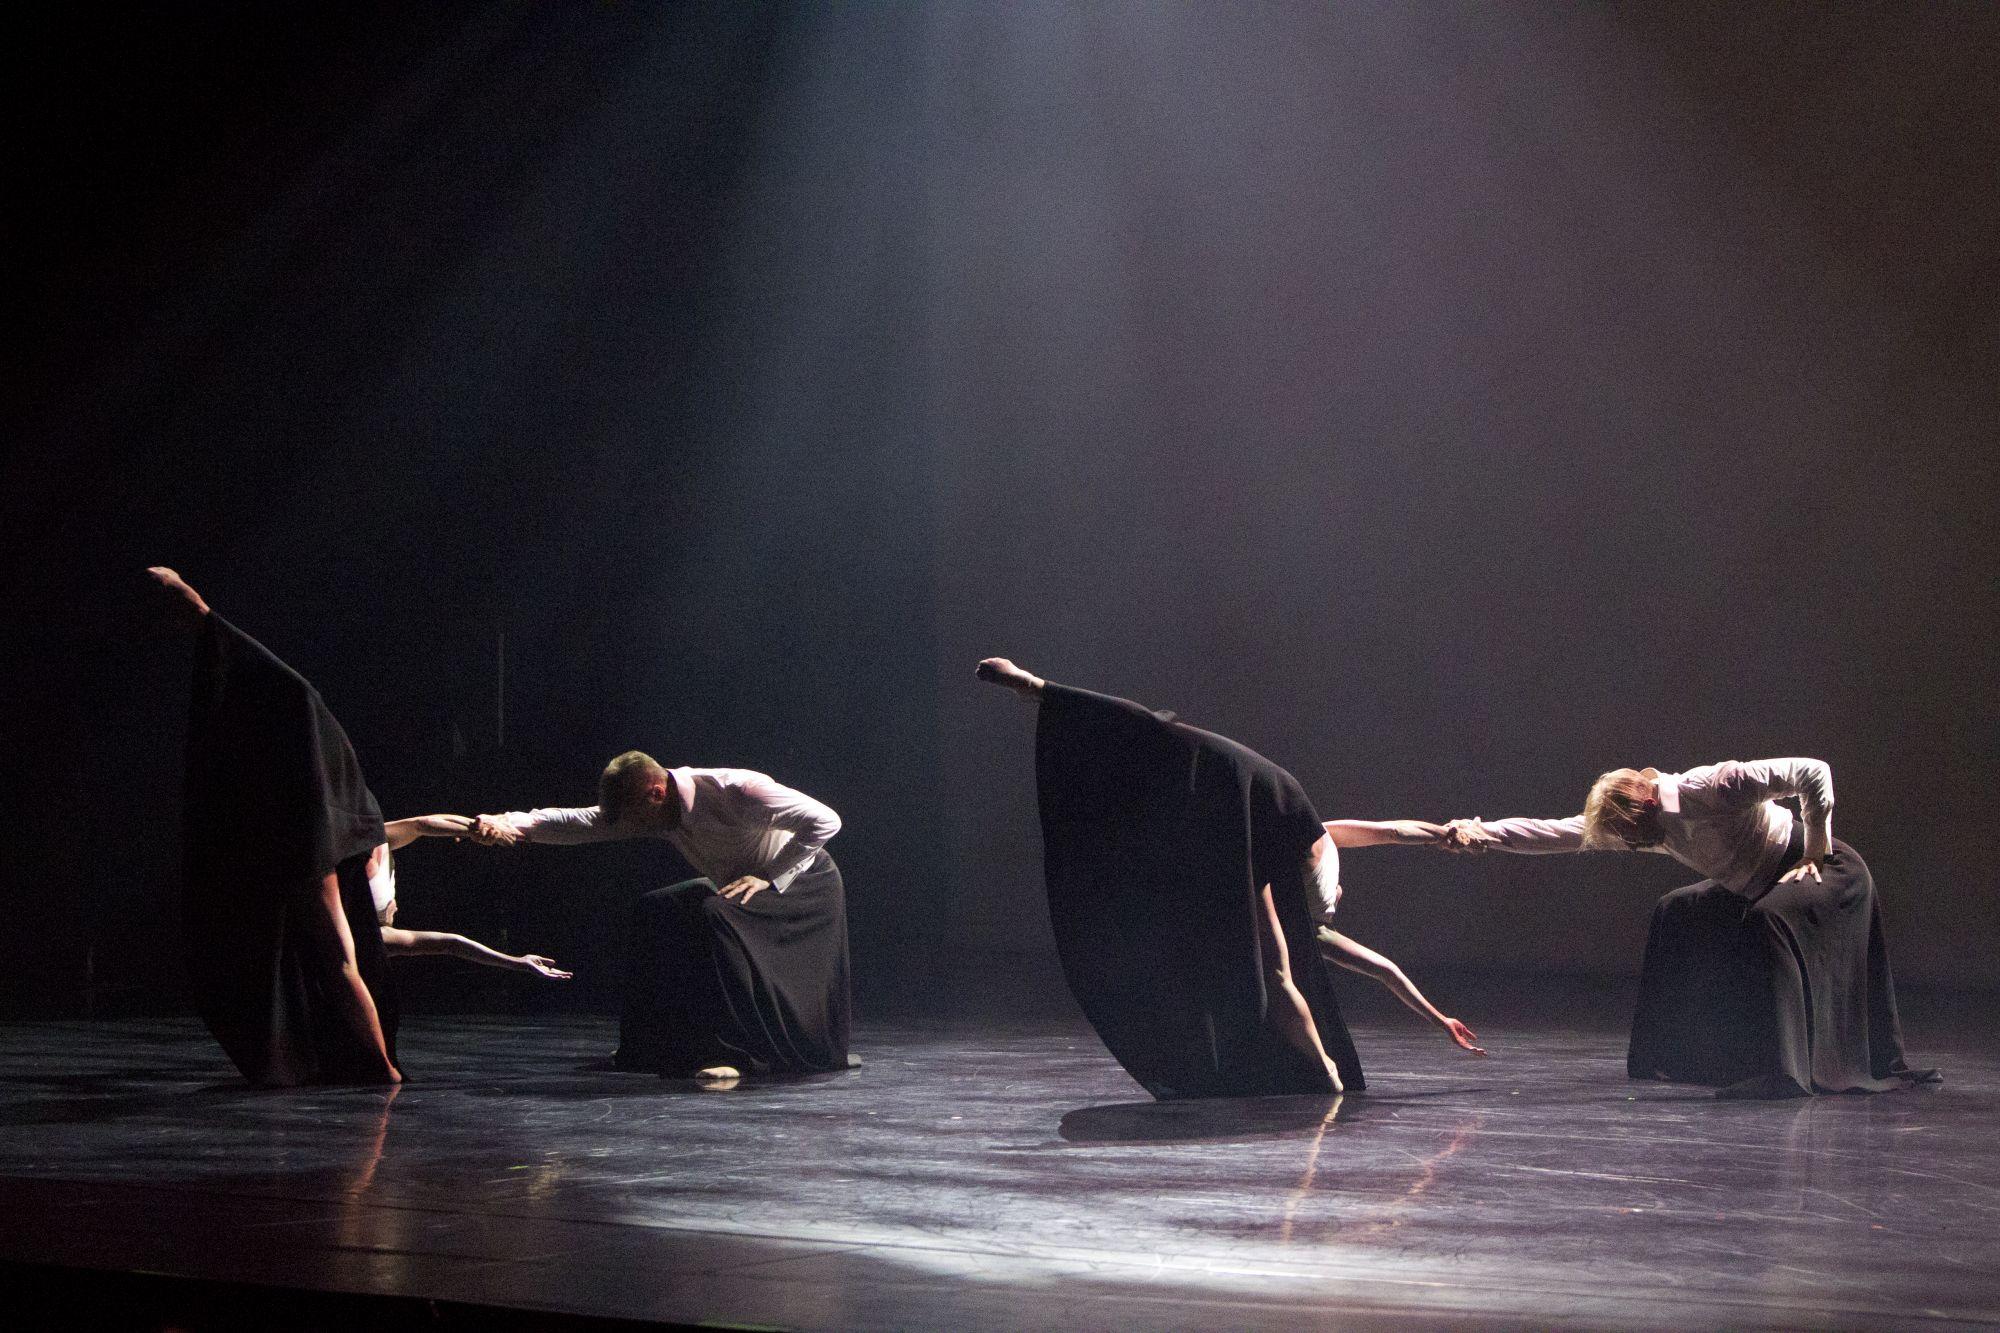 Pori Dance Company, Hetkien vaellus